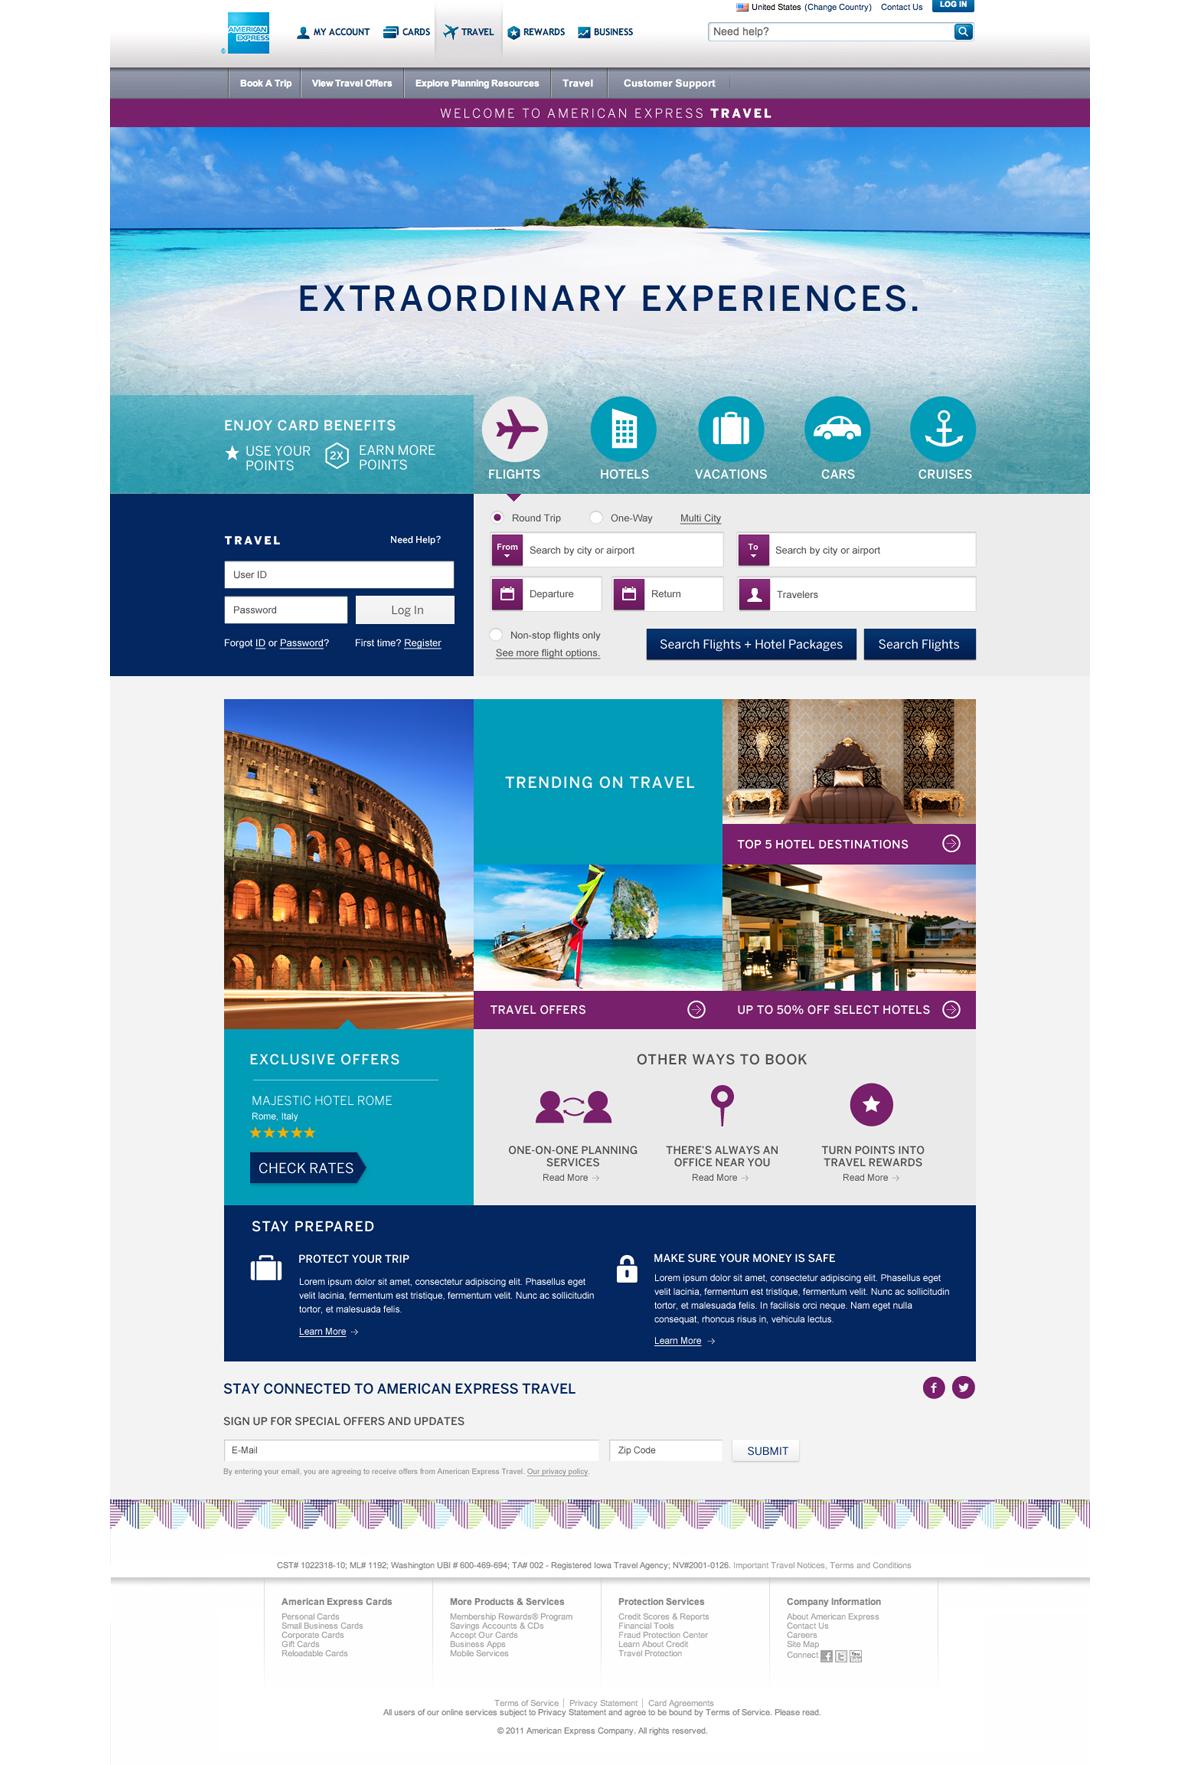 Explore Travel Akiko Design Explore Travel Travel Rewards Cruise Travel